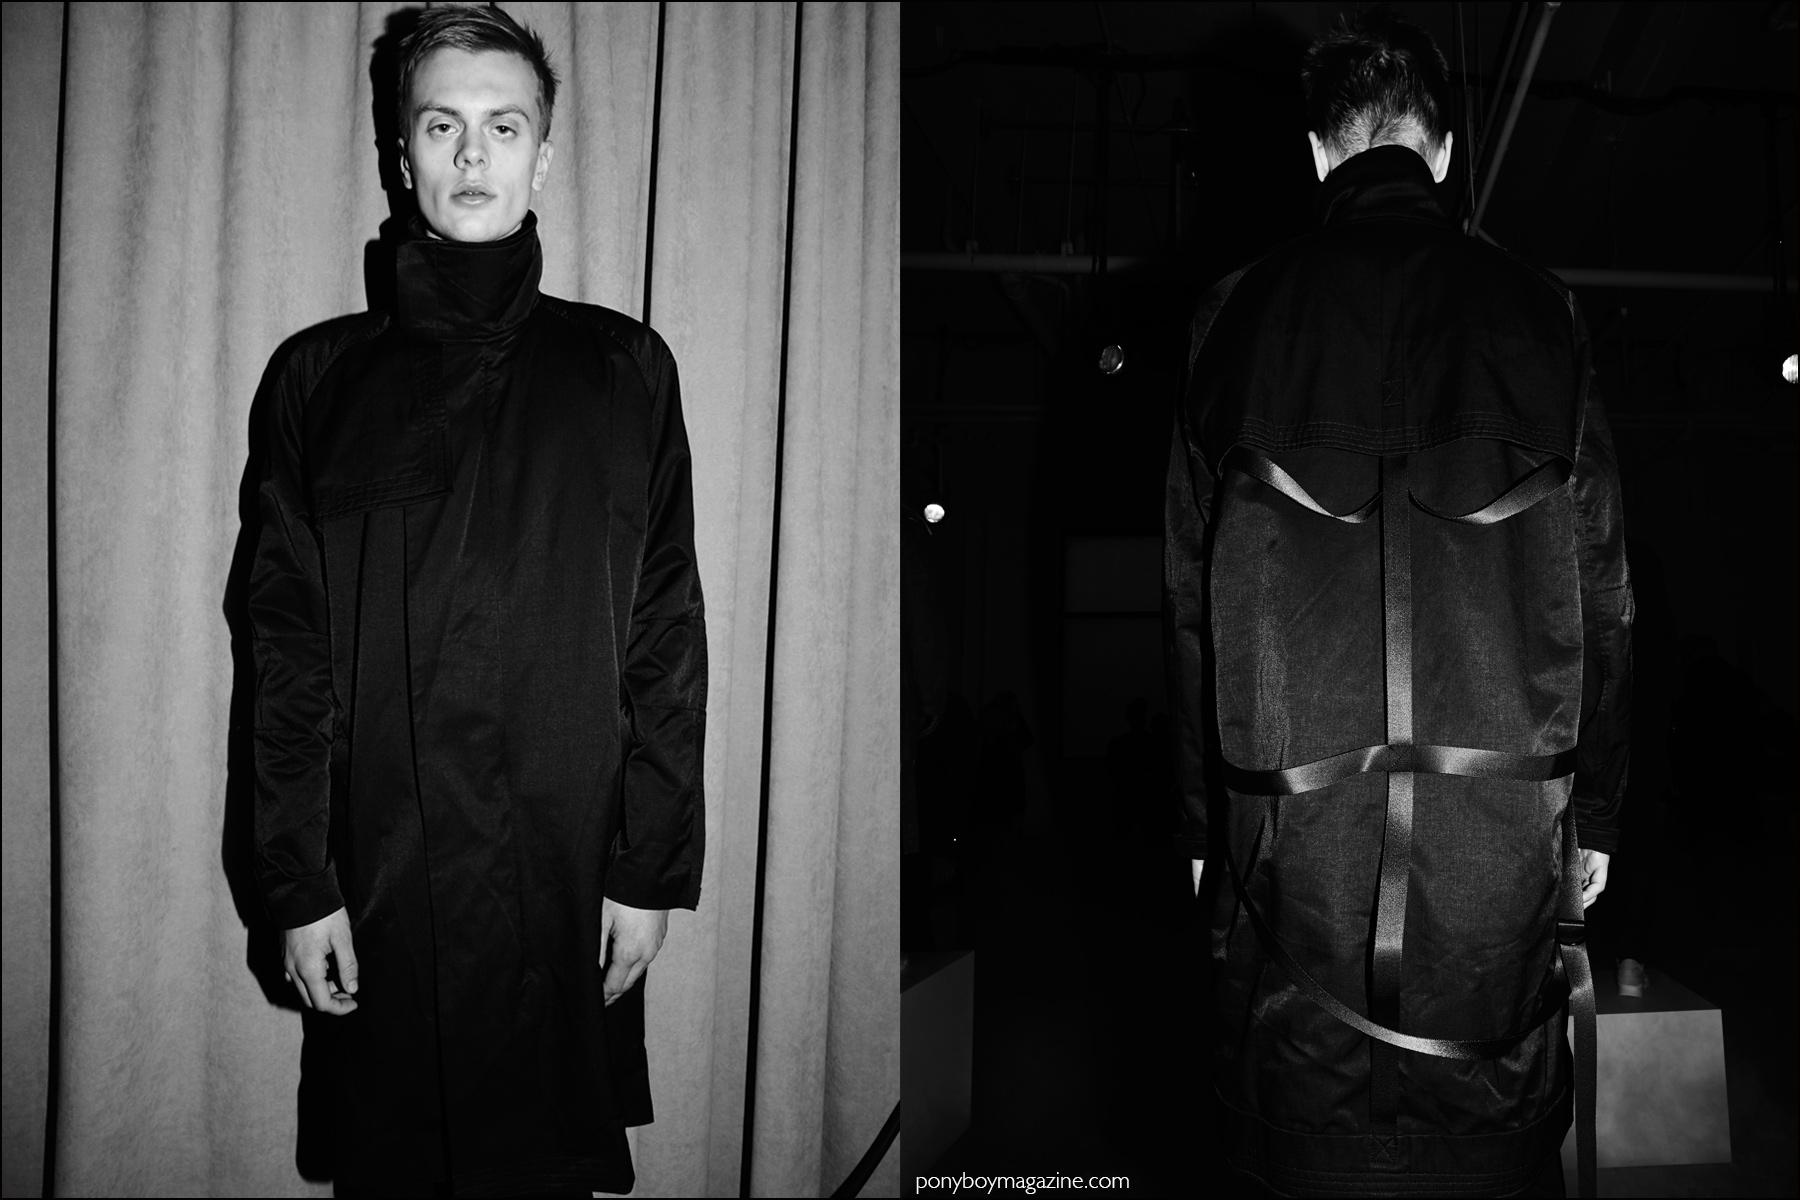 Model Ian Weglarz photographed backstage at Stampd F/W16 menswear show by Alexander Thompson for Ponyboy magazine NY.